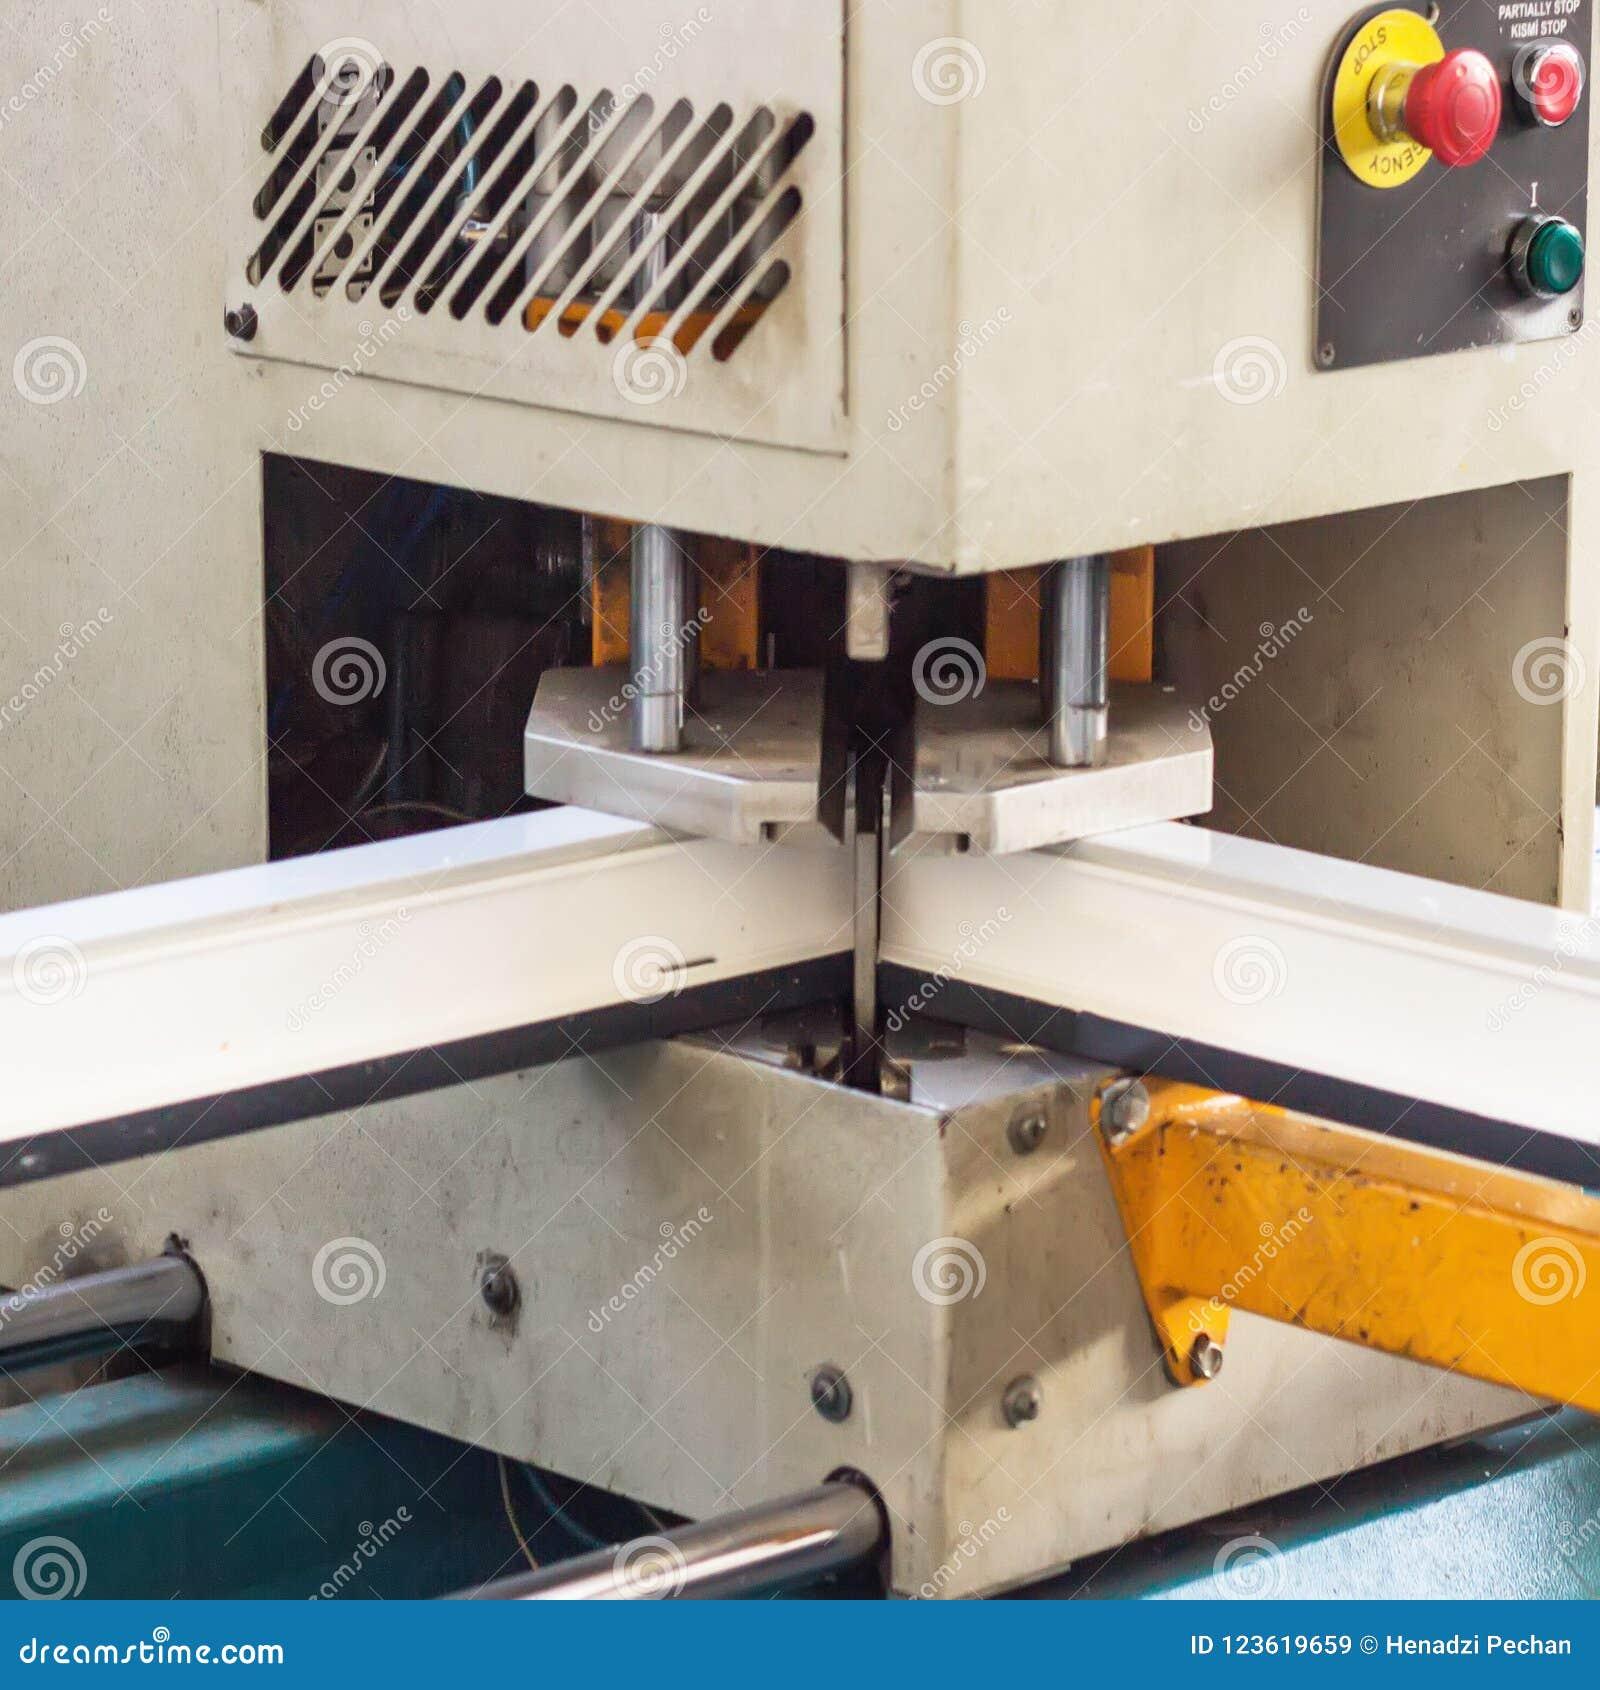 Ventanas Pvc Stock.Production Of Pvc Windows Gluing Of Plastic Corners Of